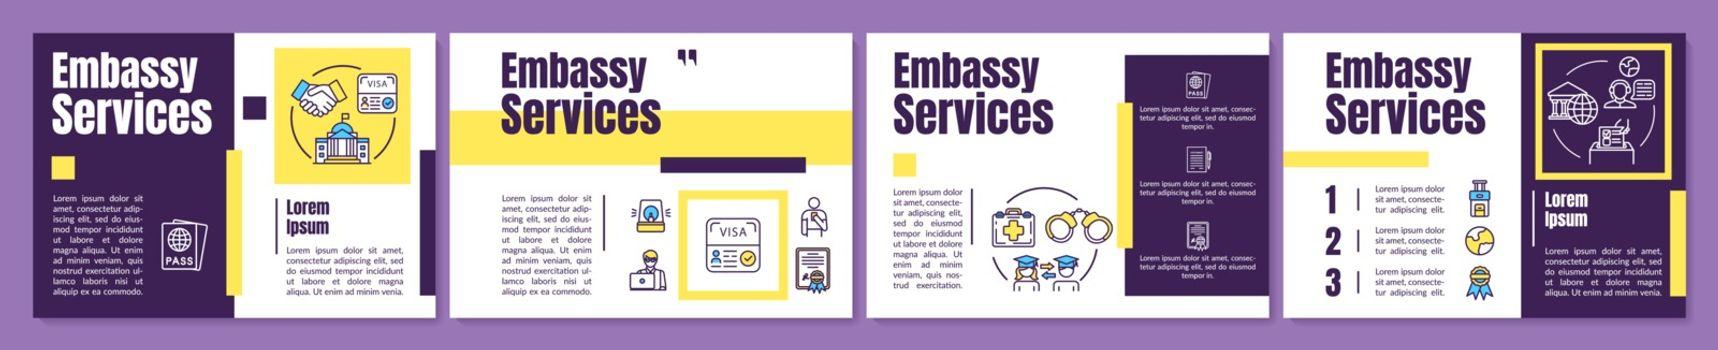 Embassy assistance brochure template